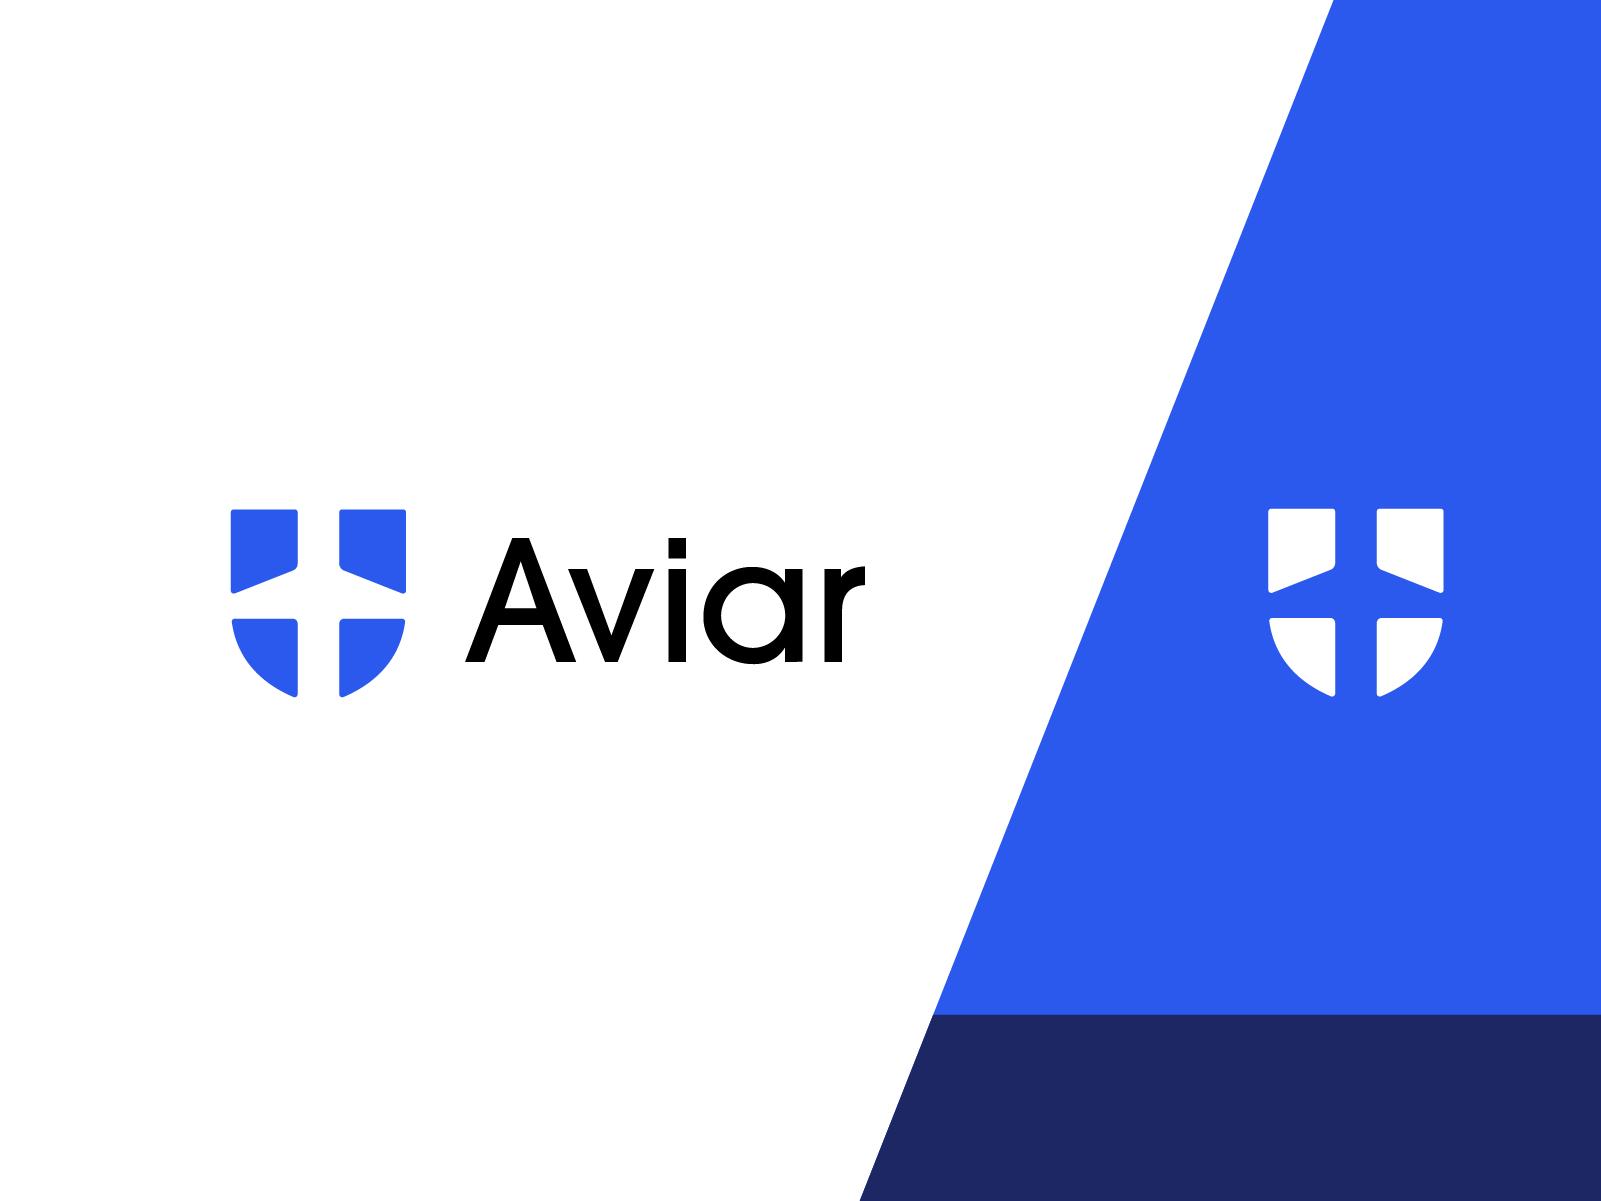 aviar logo design